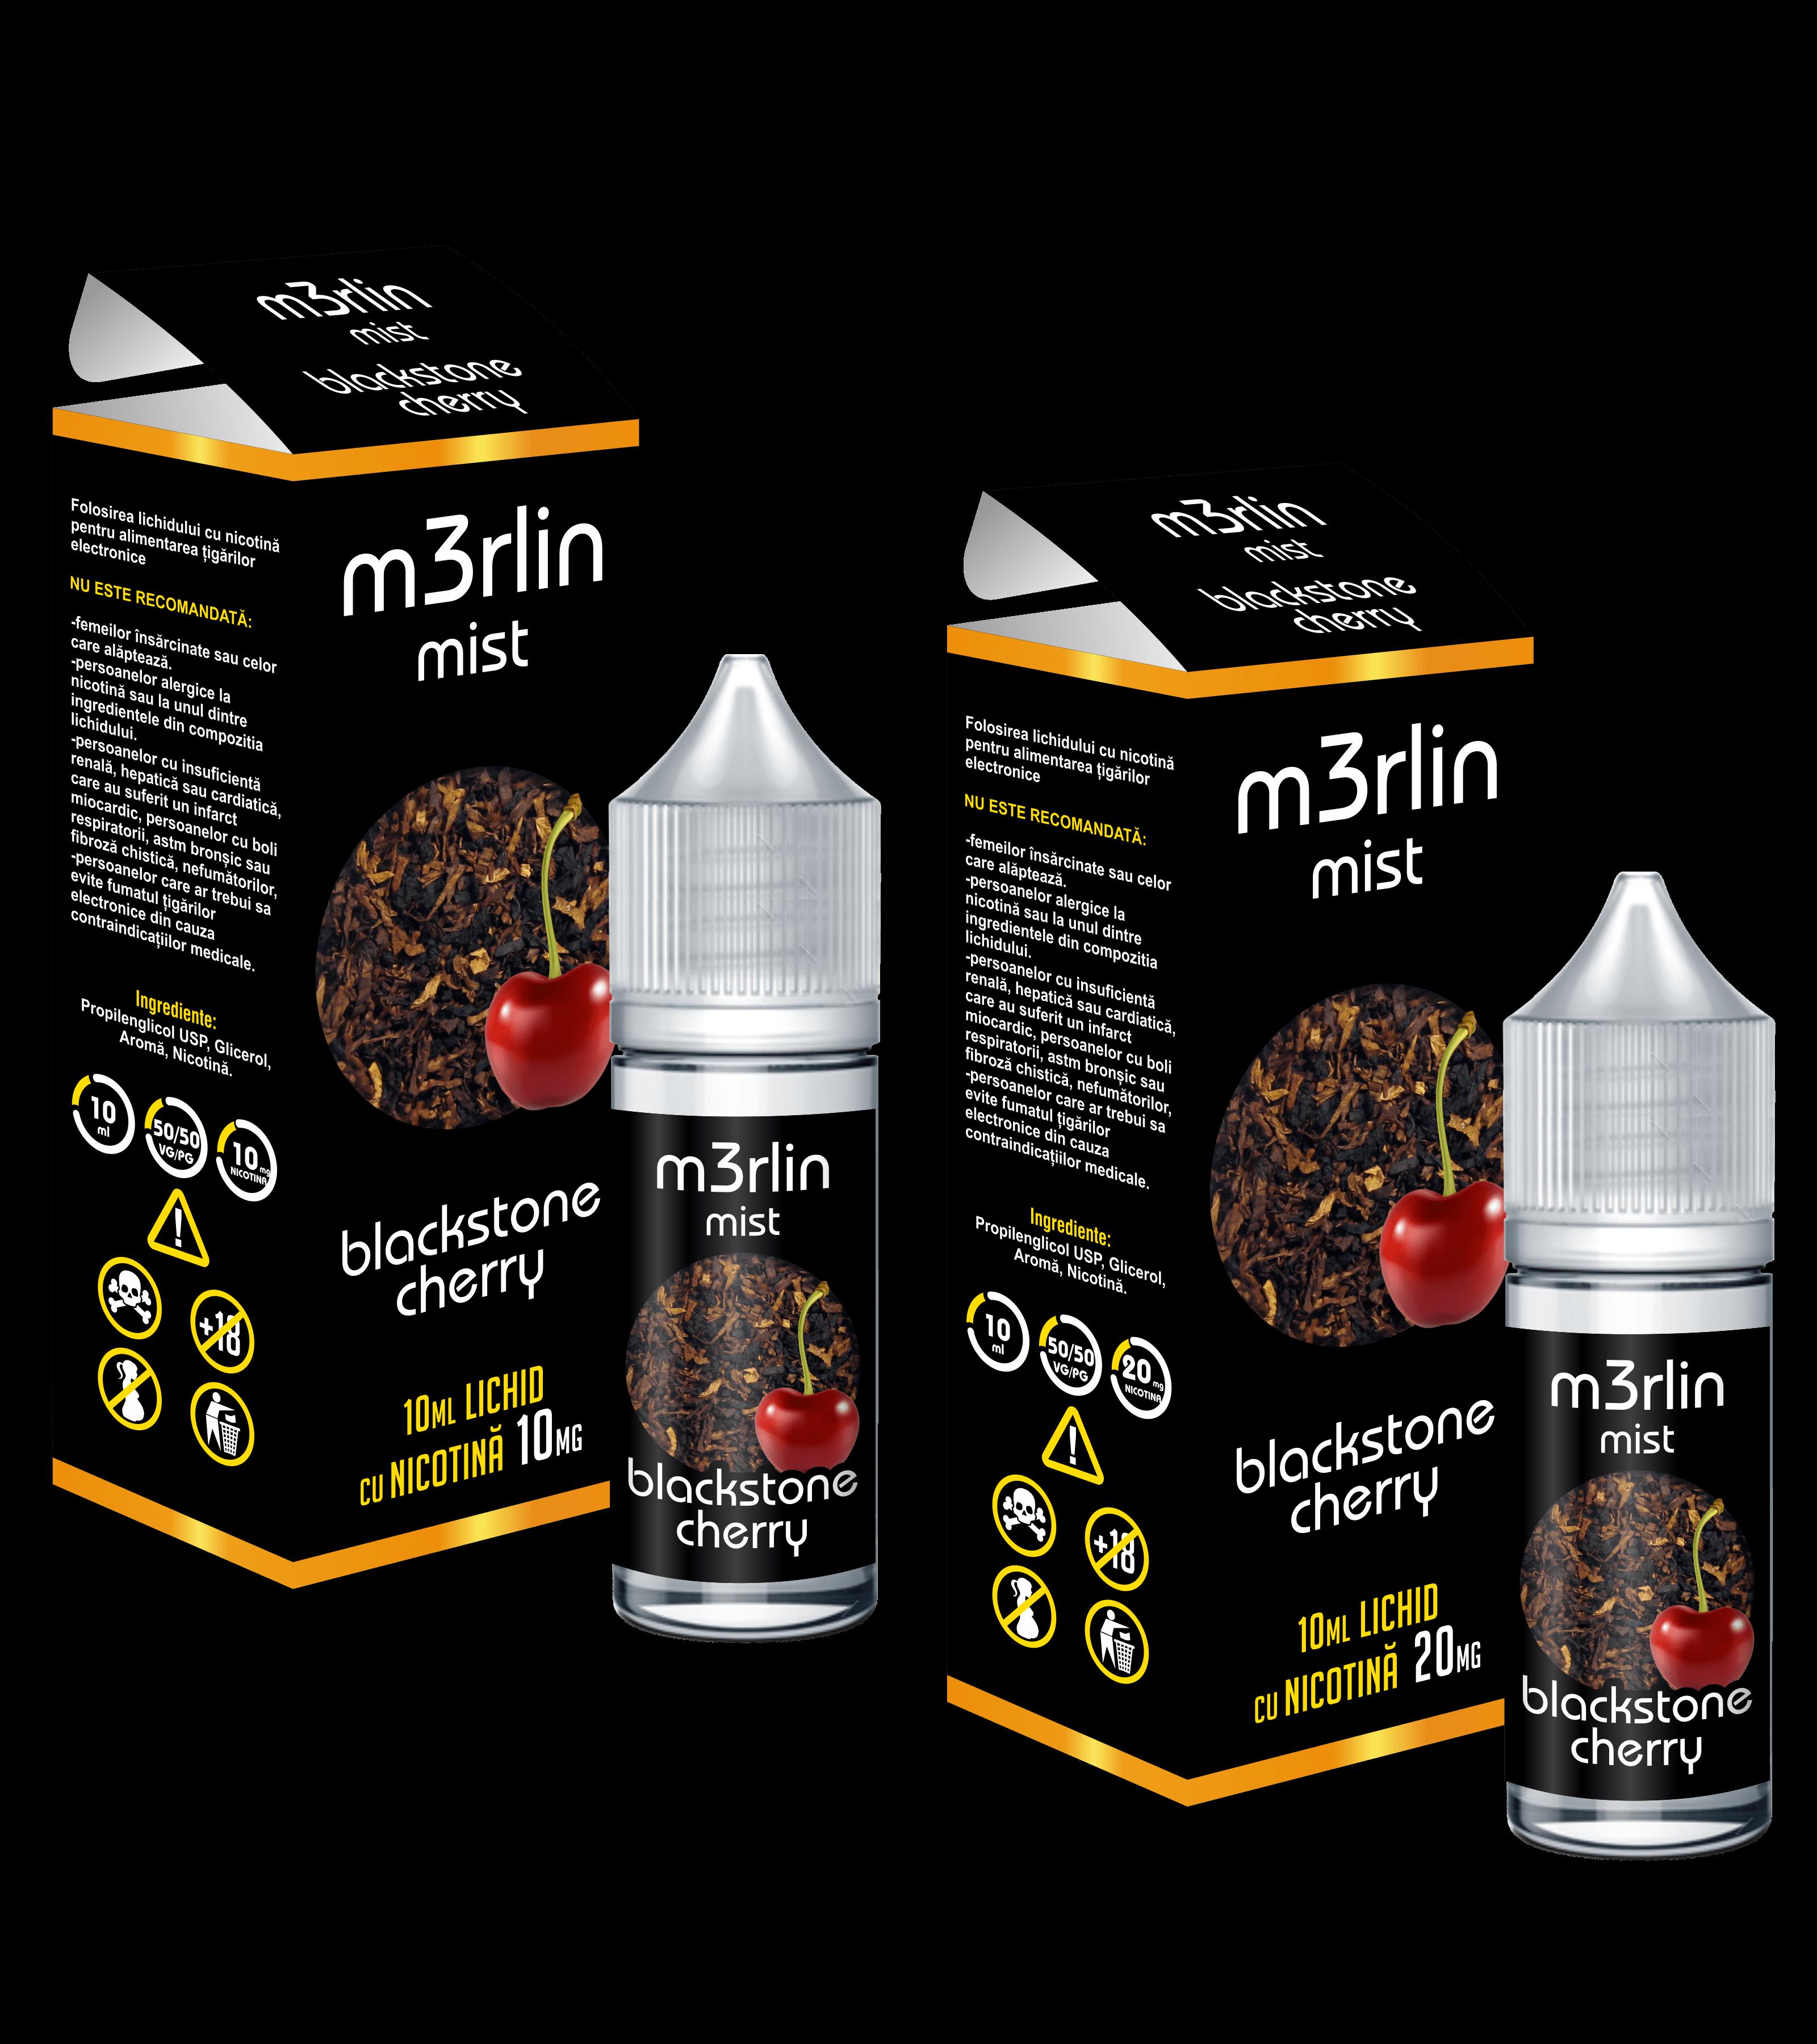 Lichid Tigara Electronica M3rlin Mist Blackstone Cherry 10ml